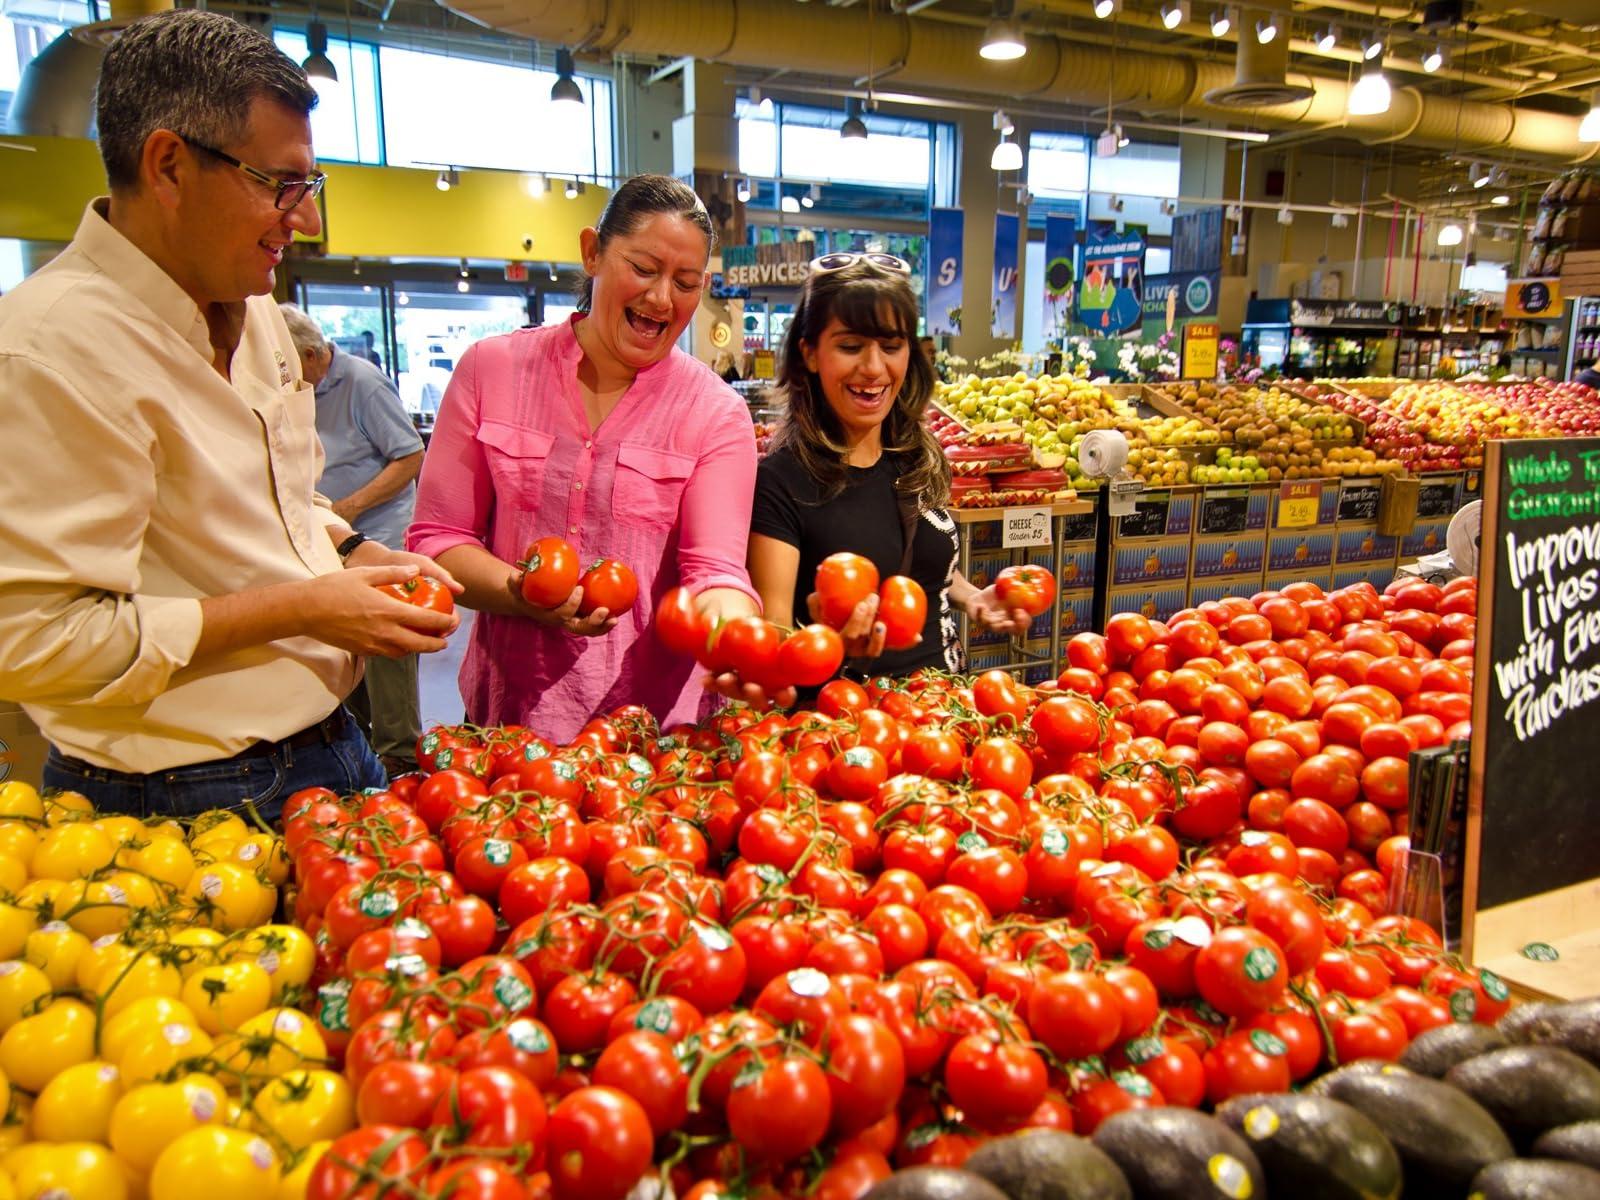 Olga (center) and Rosa Maria (right) examine Whole Trade® produce in a store.